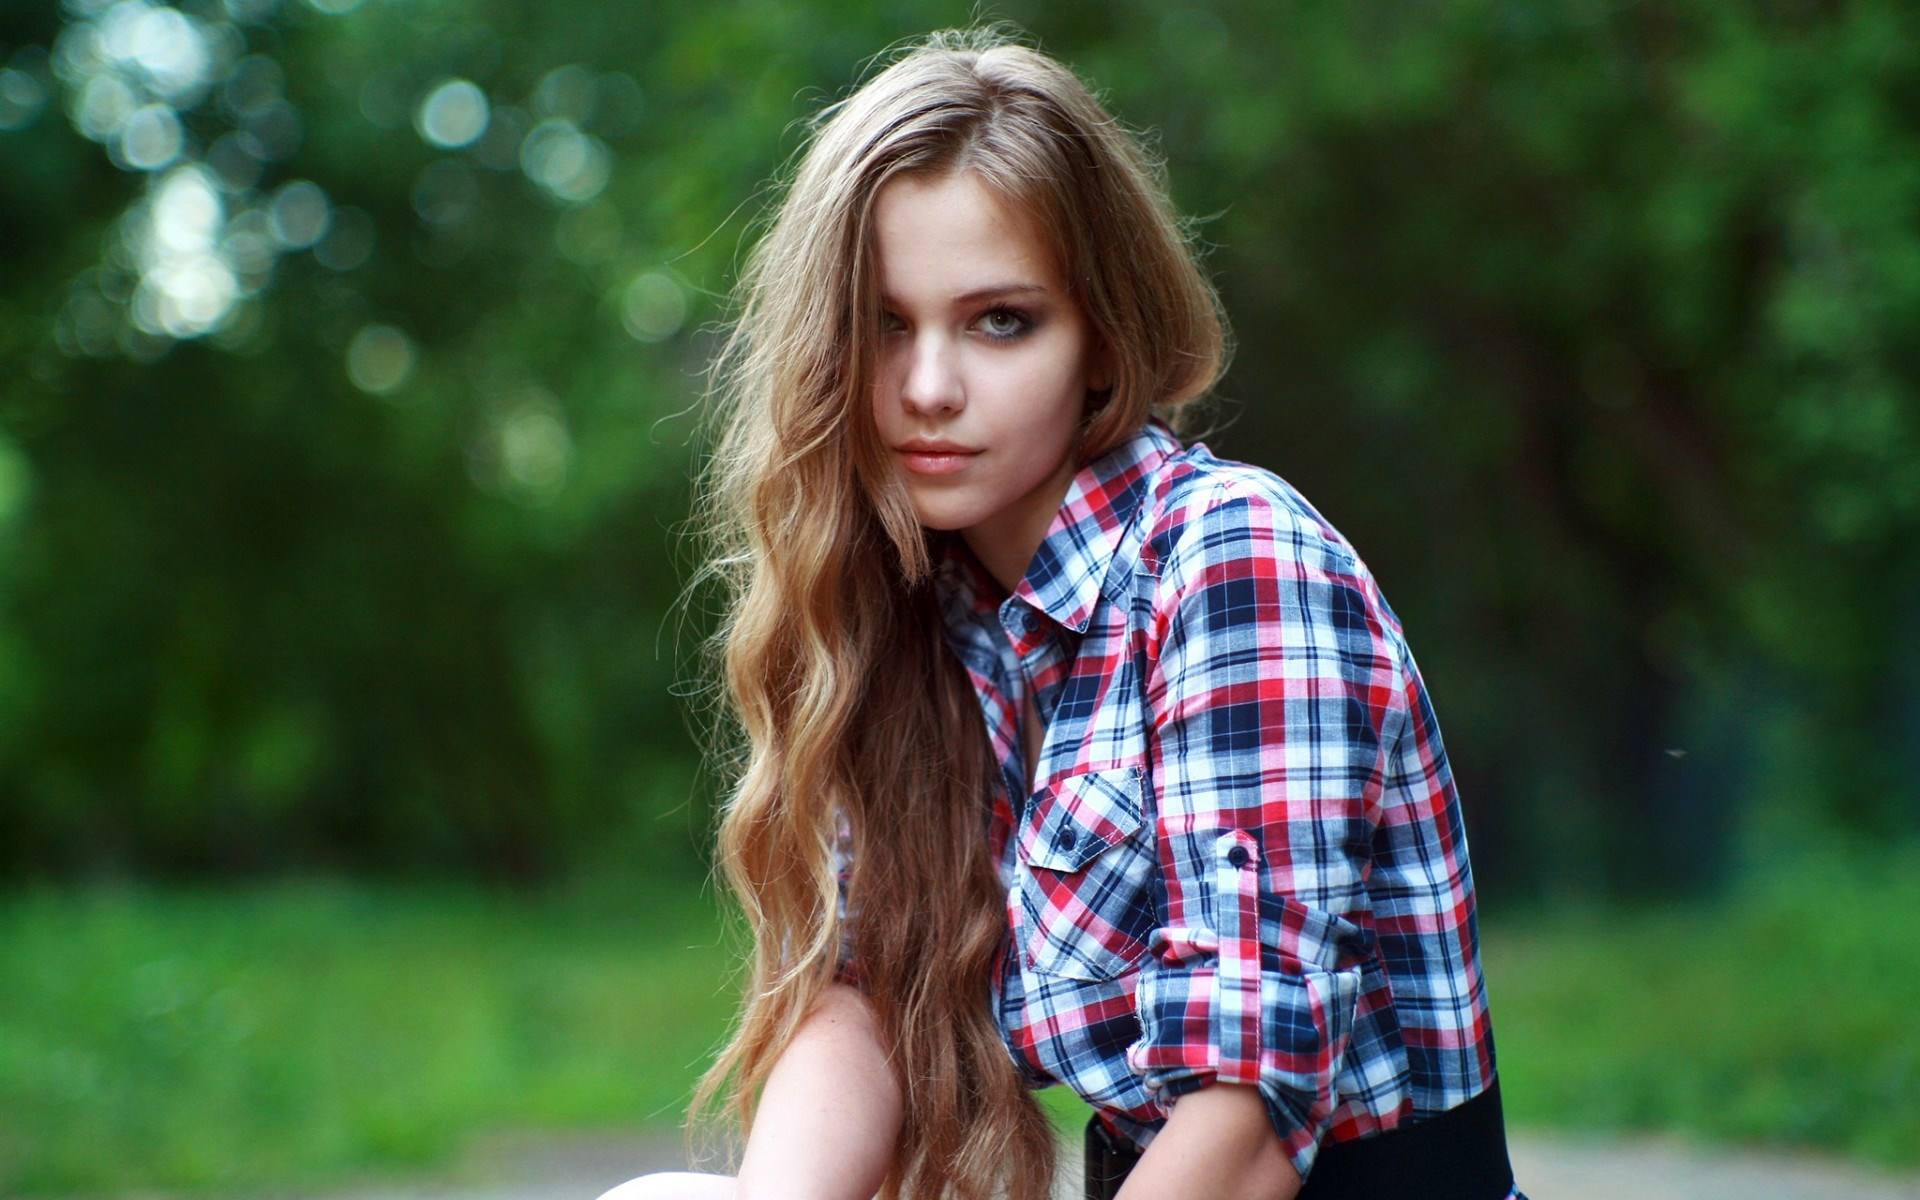 Lovely Girl Blonde Look Photo